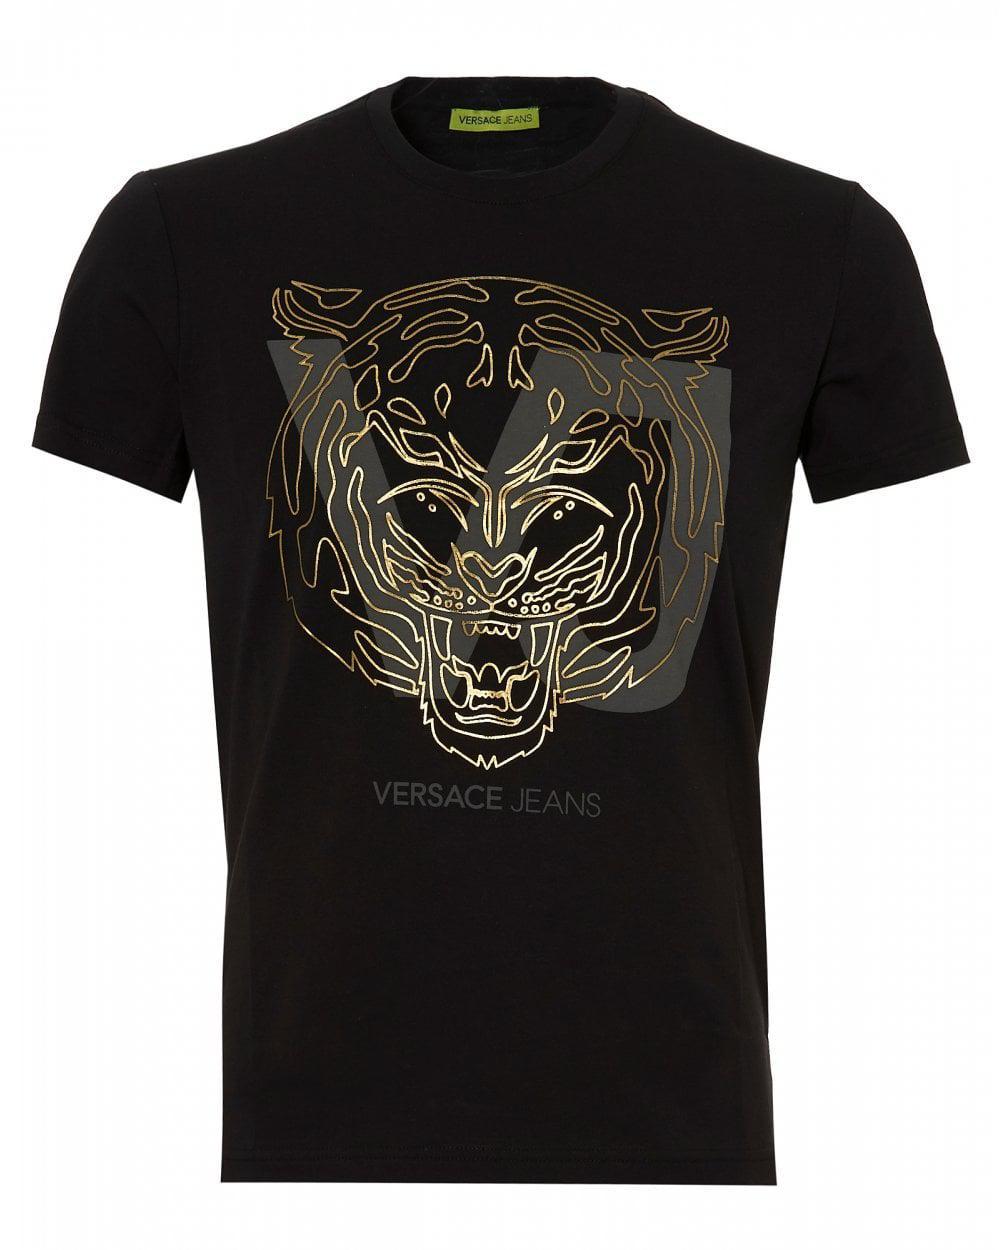 98bc1227b3 Versace Jeans - Black B3gsa72e T Shirt for Men - Lyst. View fullscreen